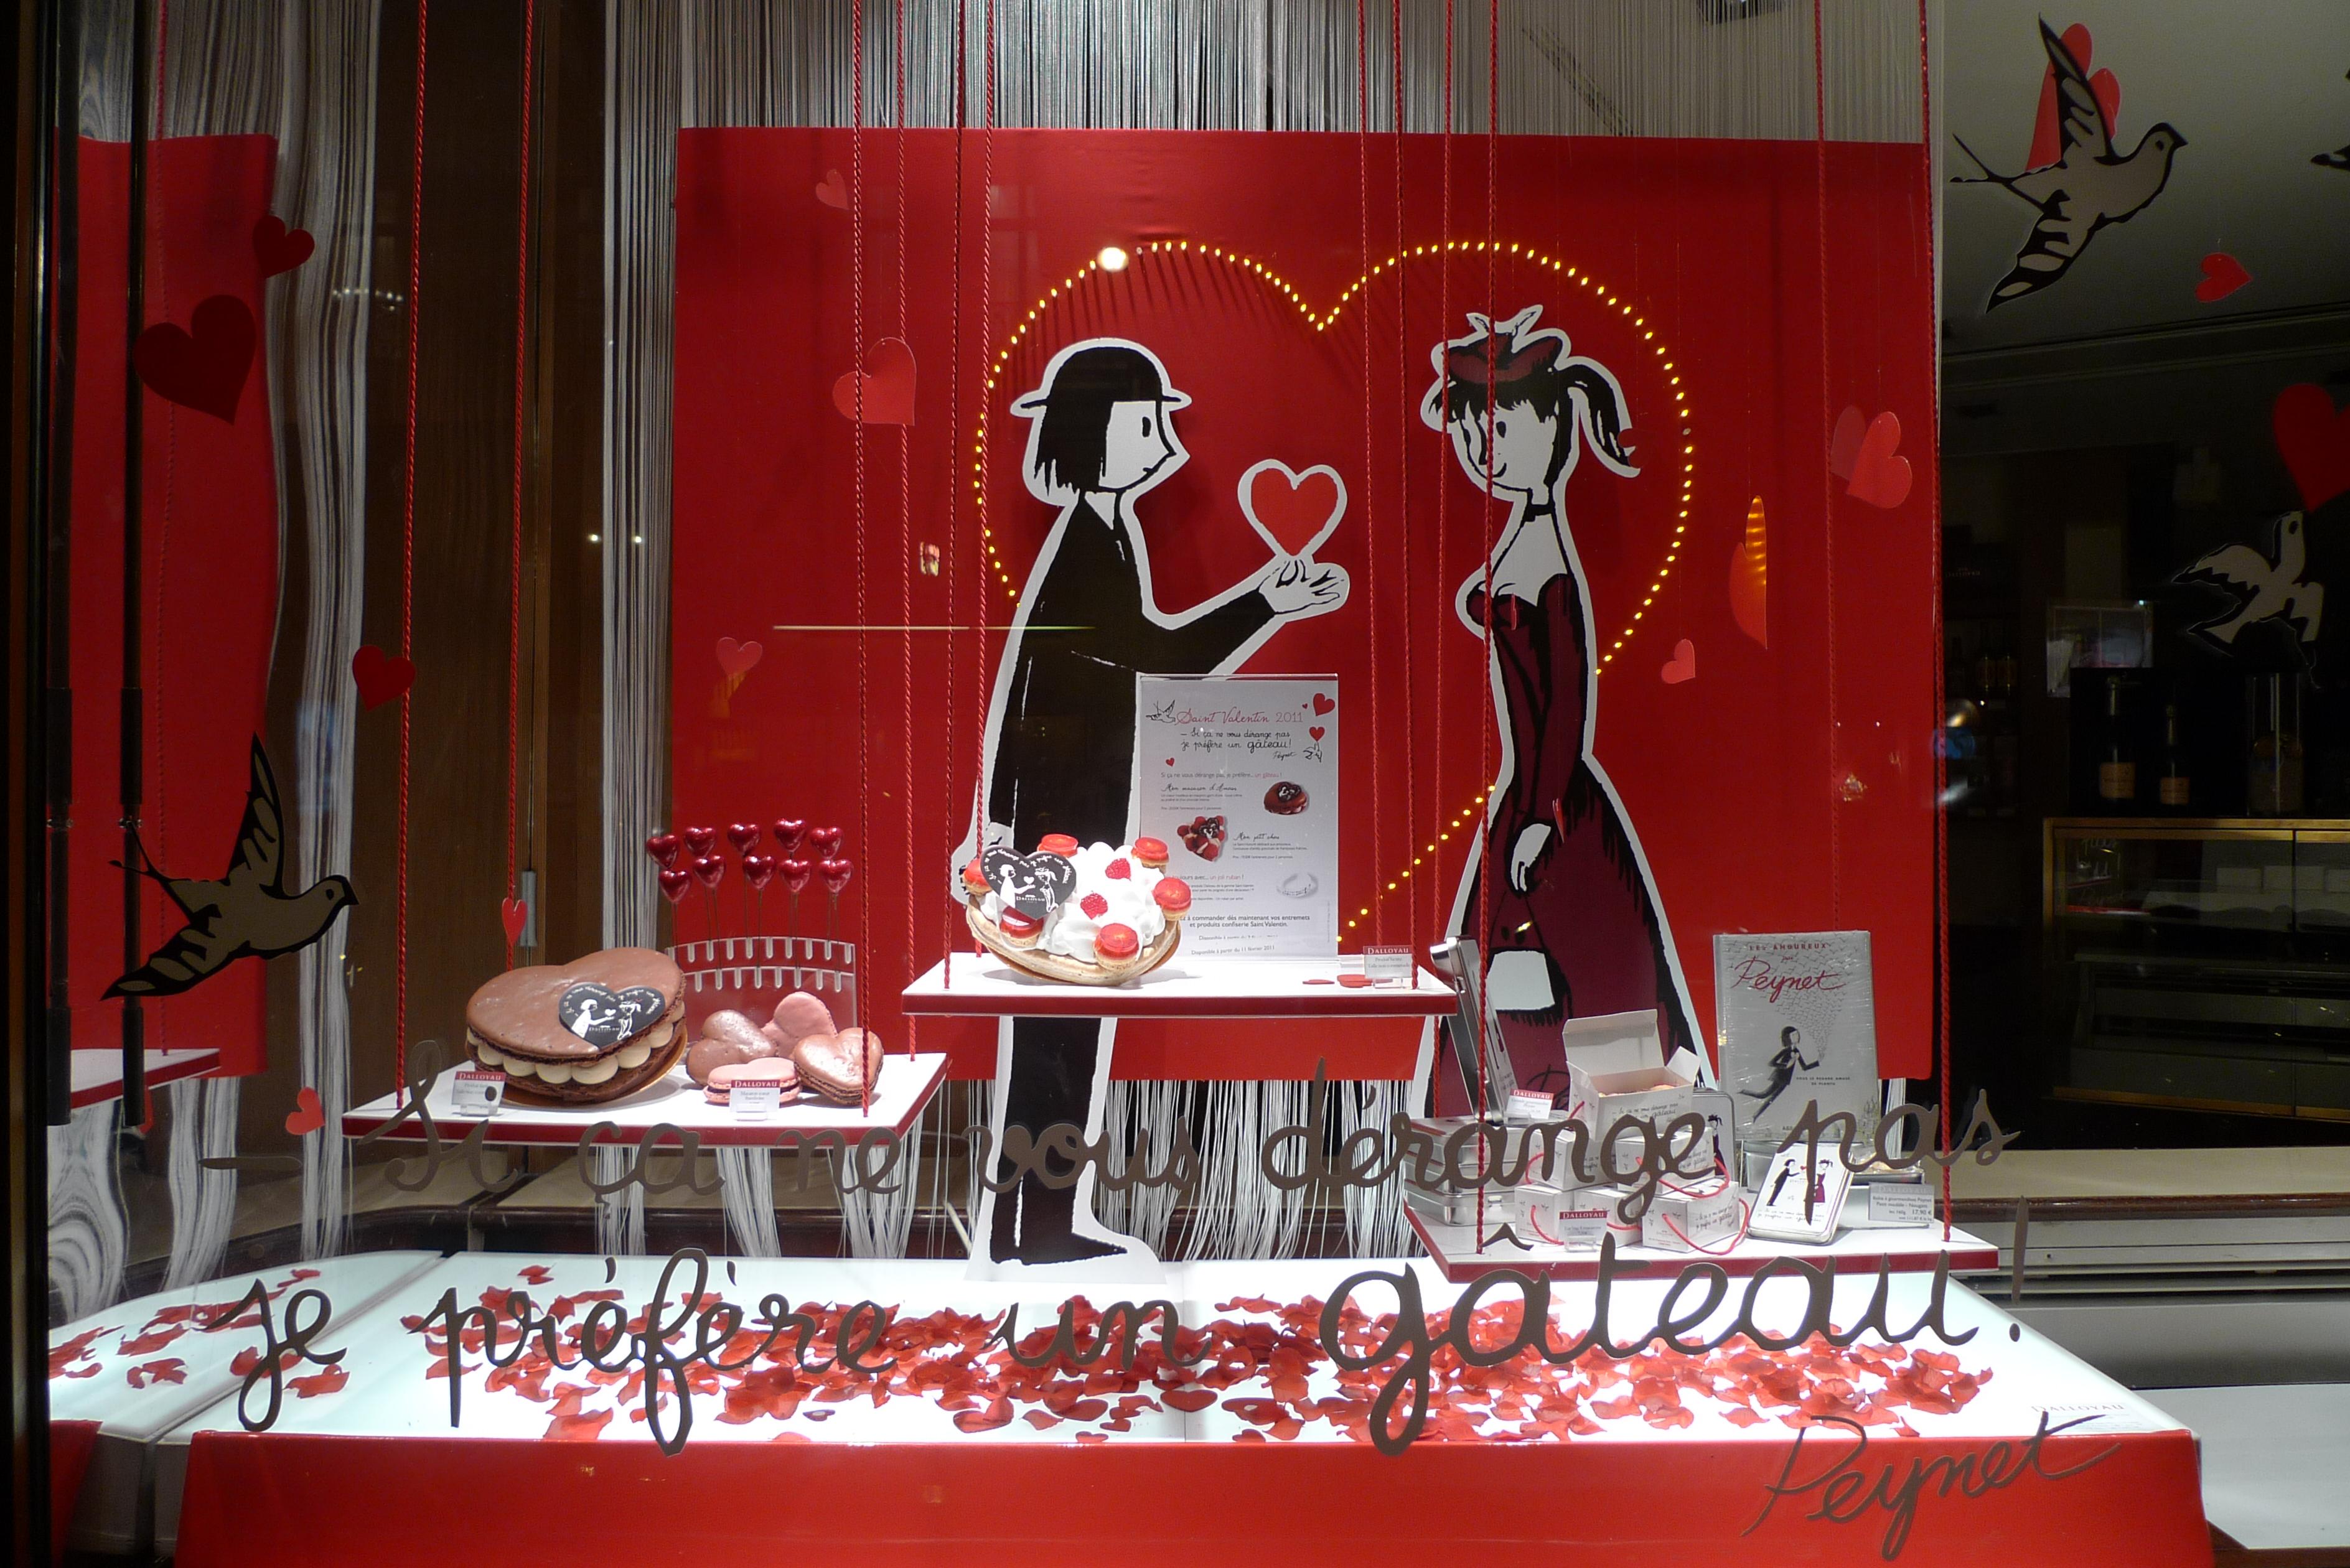 vitrine dalloyau saint valentin paris f vrier 2011 flickr photo sharing. Black Bedroom Furniture Sets. Home Design Ideas